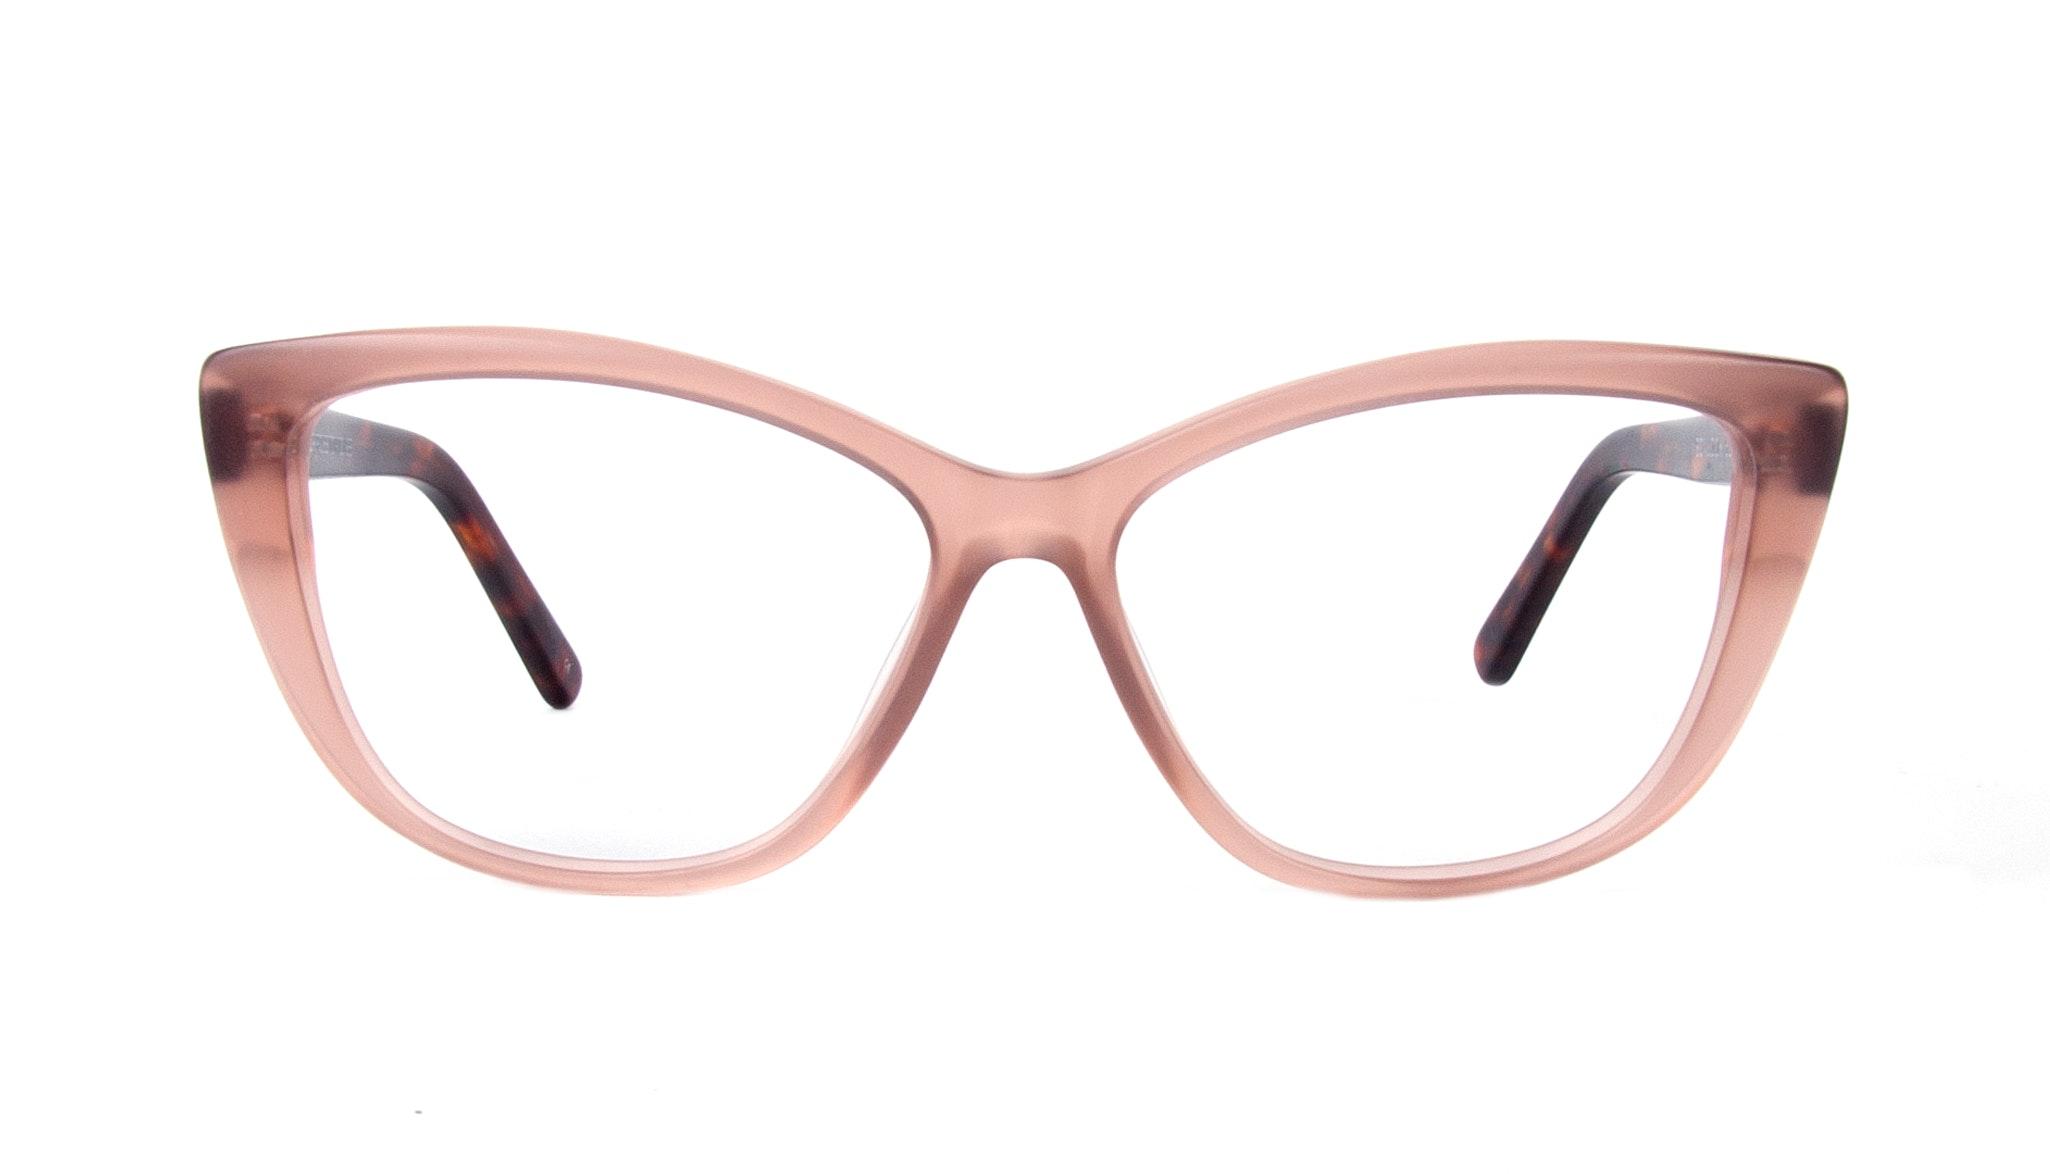 Affordable Fashion Glasses Cat Eye Eyeglasses Women Dolled Up Rose Tortoise Matte Front